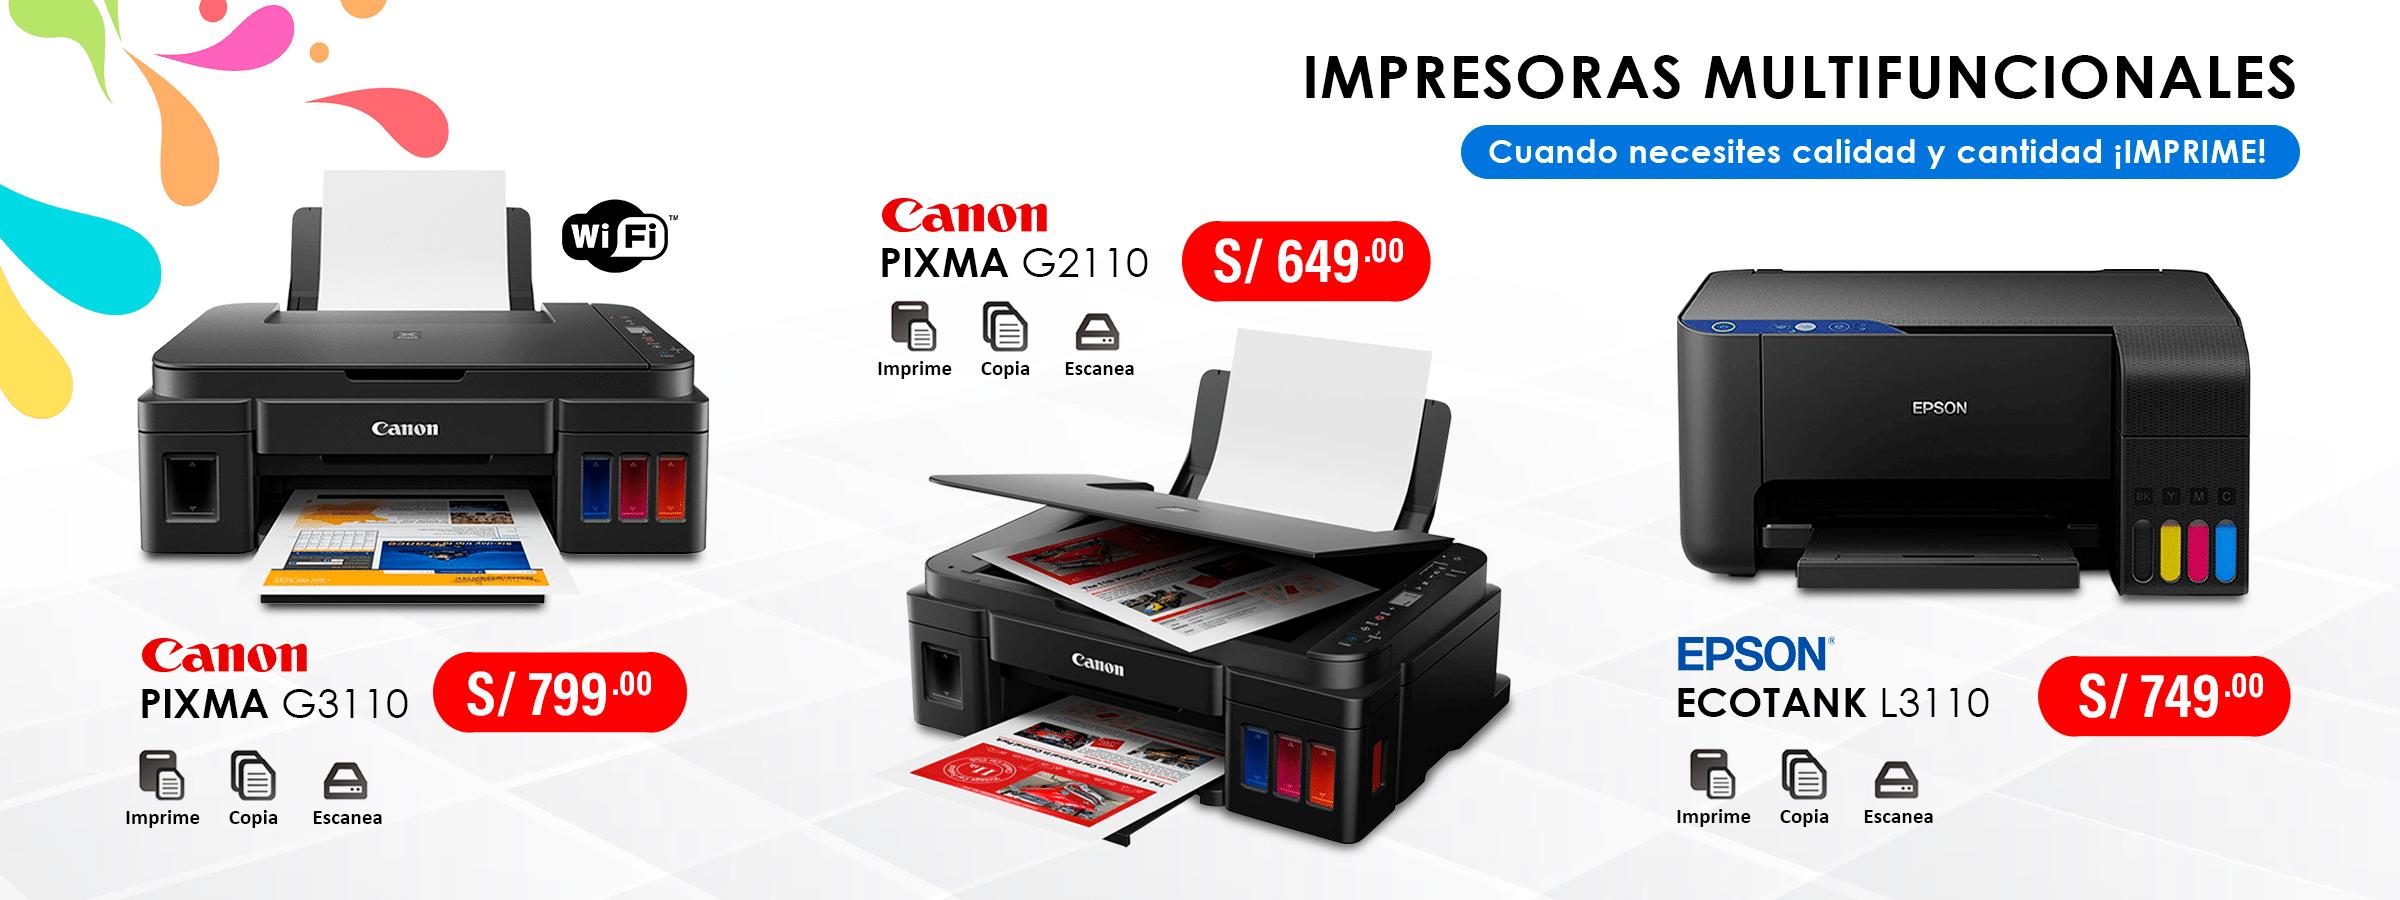 Home - IMPRESORA BANNER - R&M Portátiles